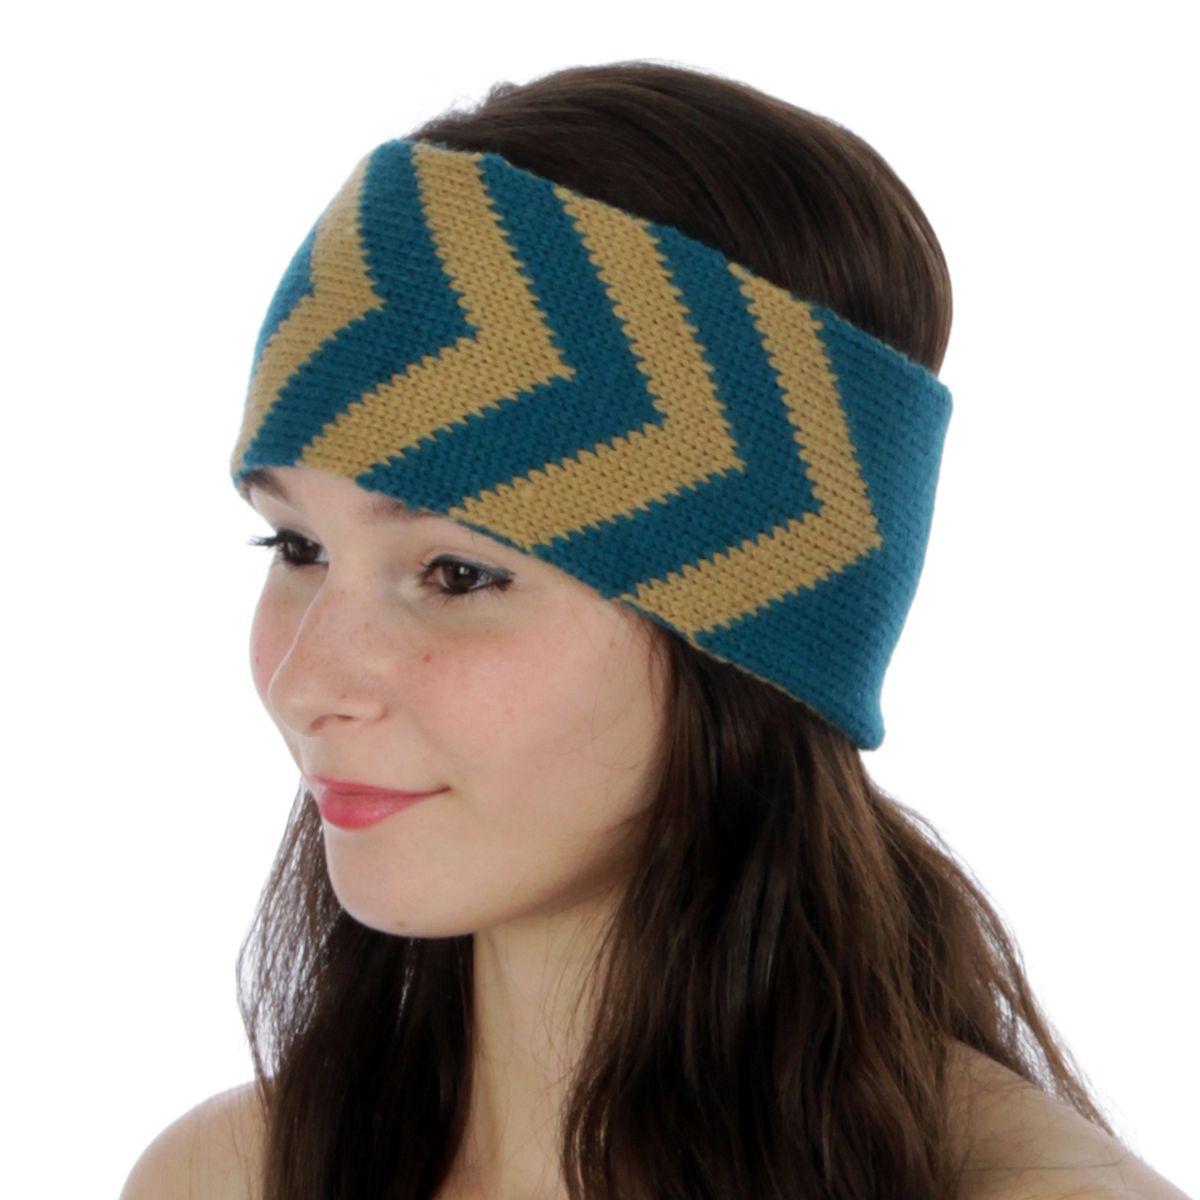 Reversible Headband Knitting Pattern : Women Acrylic Knit Chevron Reversible Winter Head Wrap ...